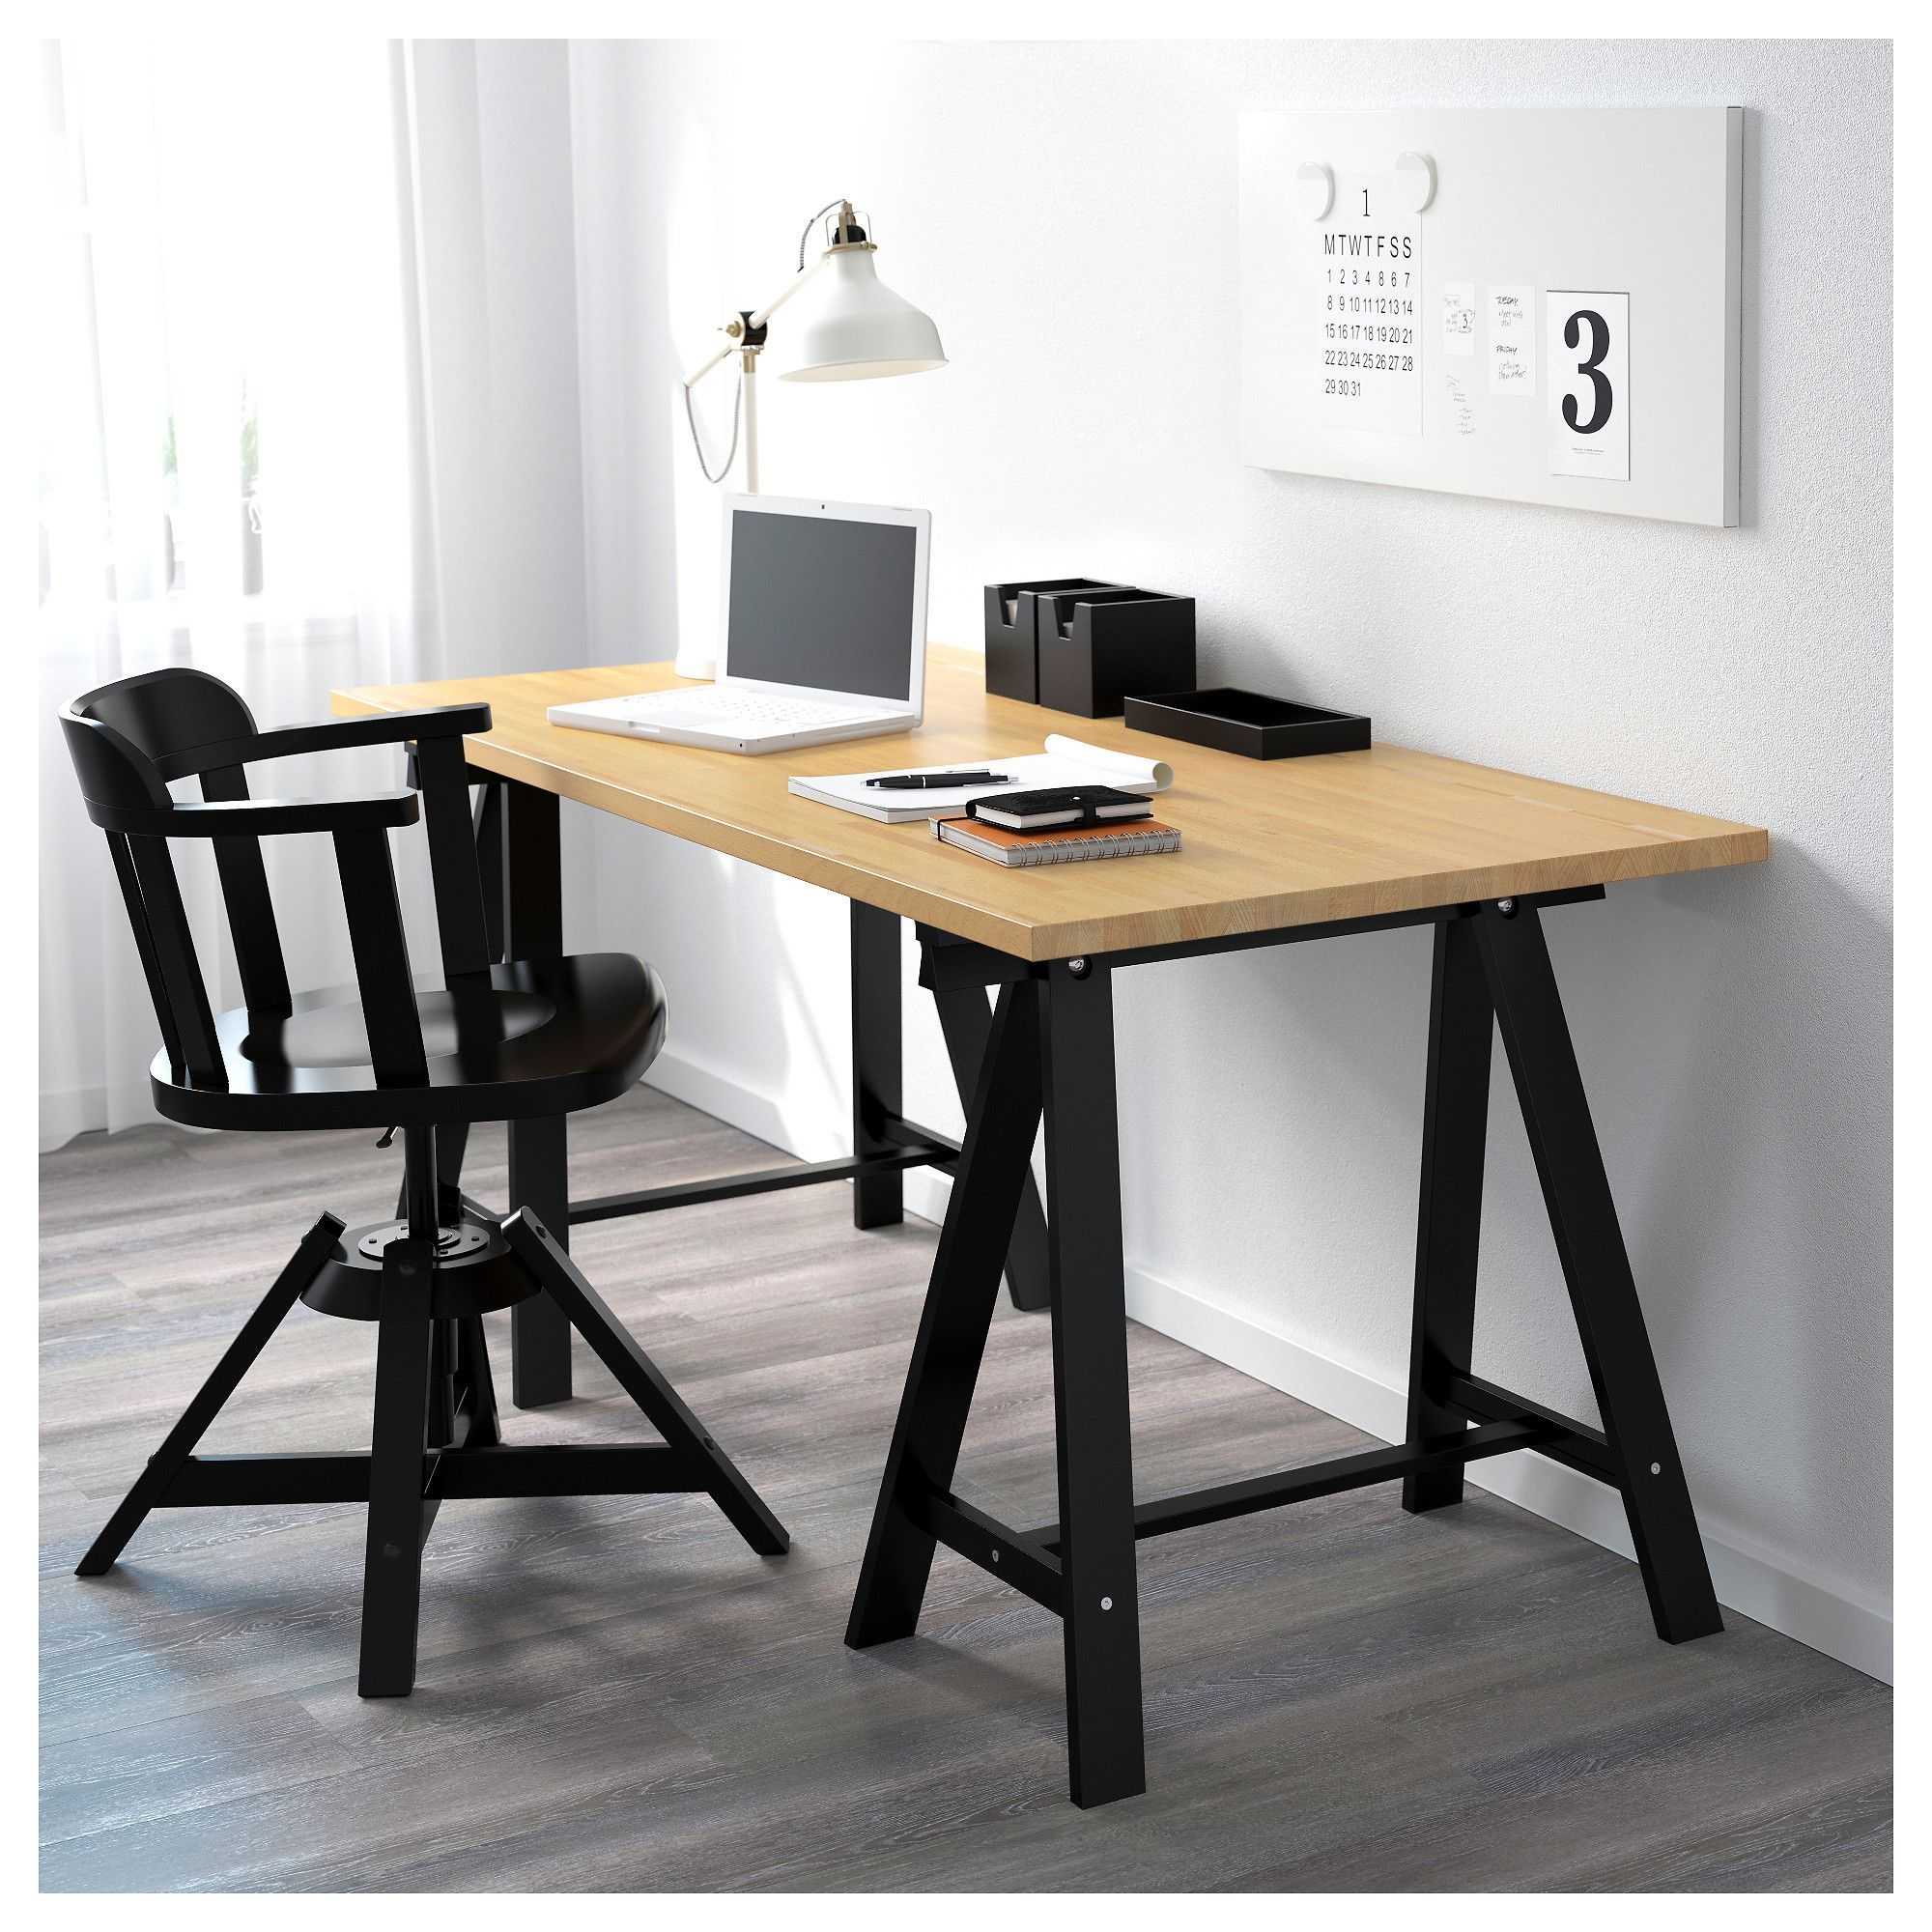 51 Astonishing Scandinavian Living Room Interior Designs Diningroom Roomdecor Scandinavianinteriordesignconcep Ikea Home Office Design Affordable Furniture